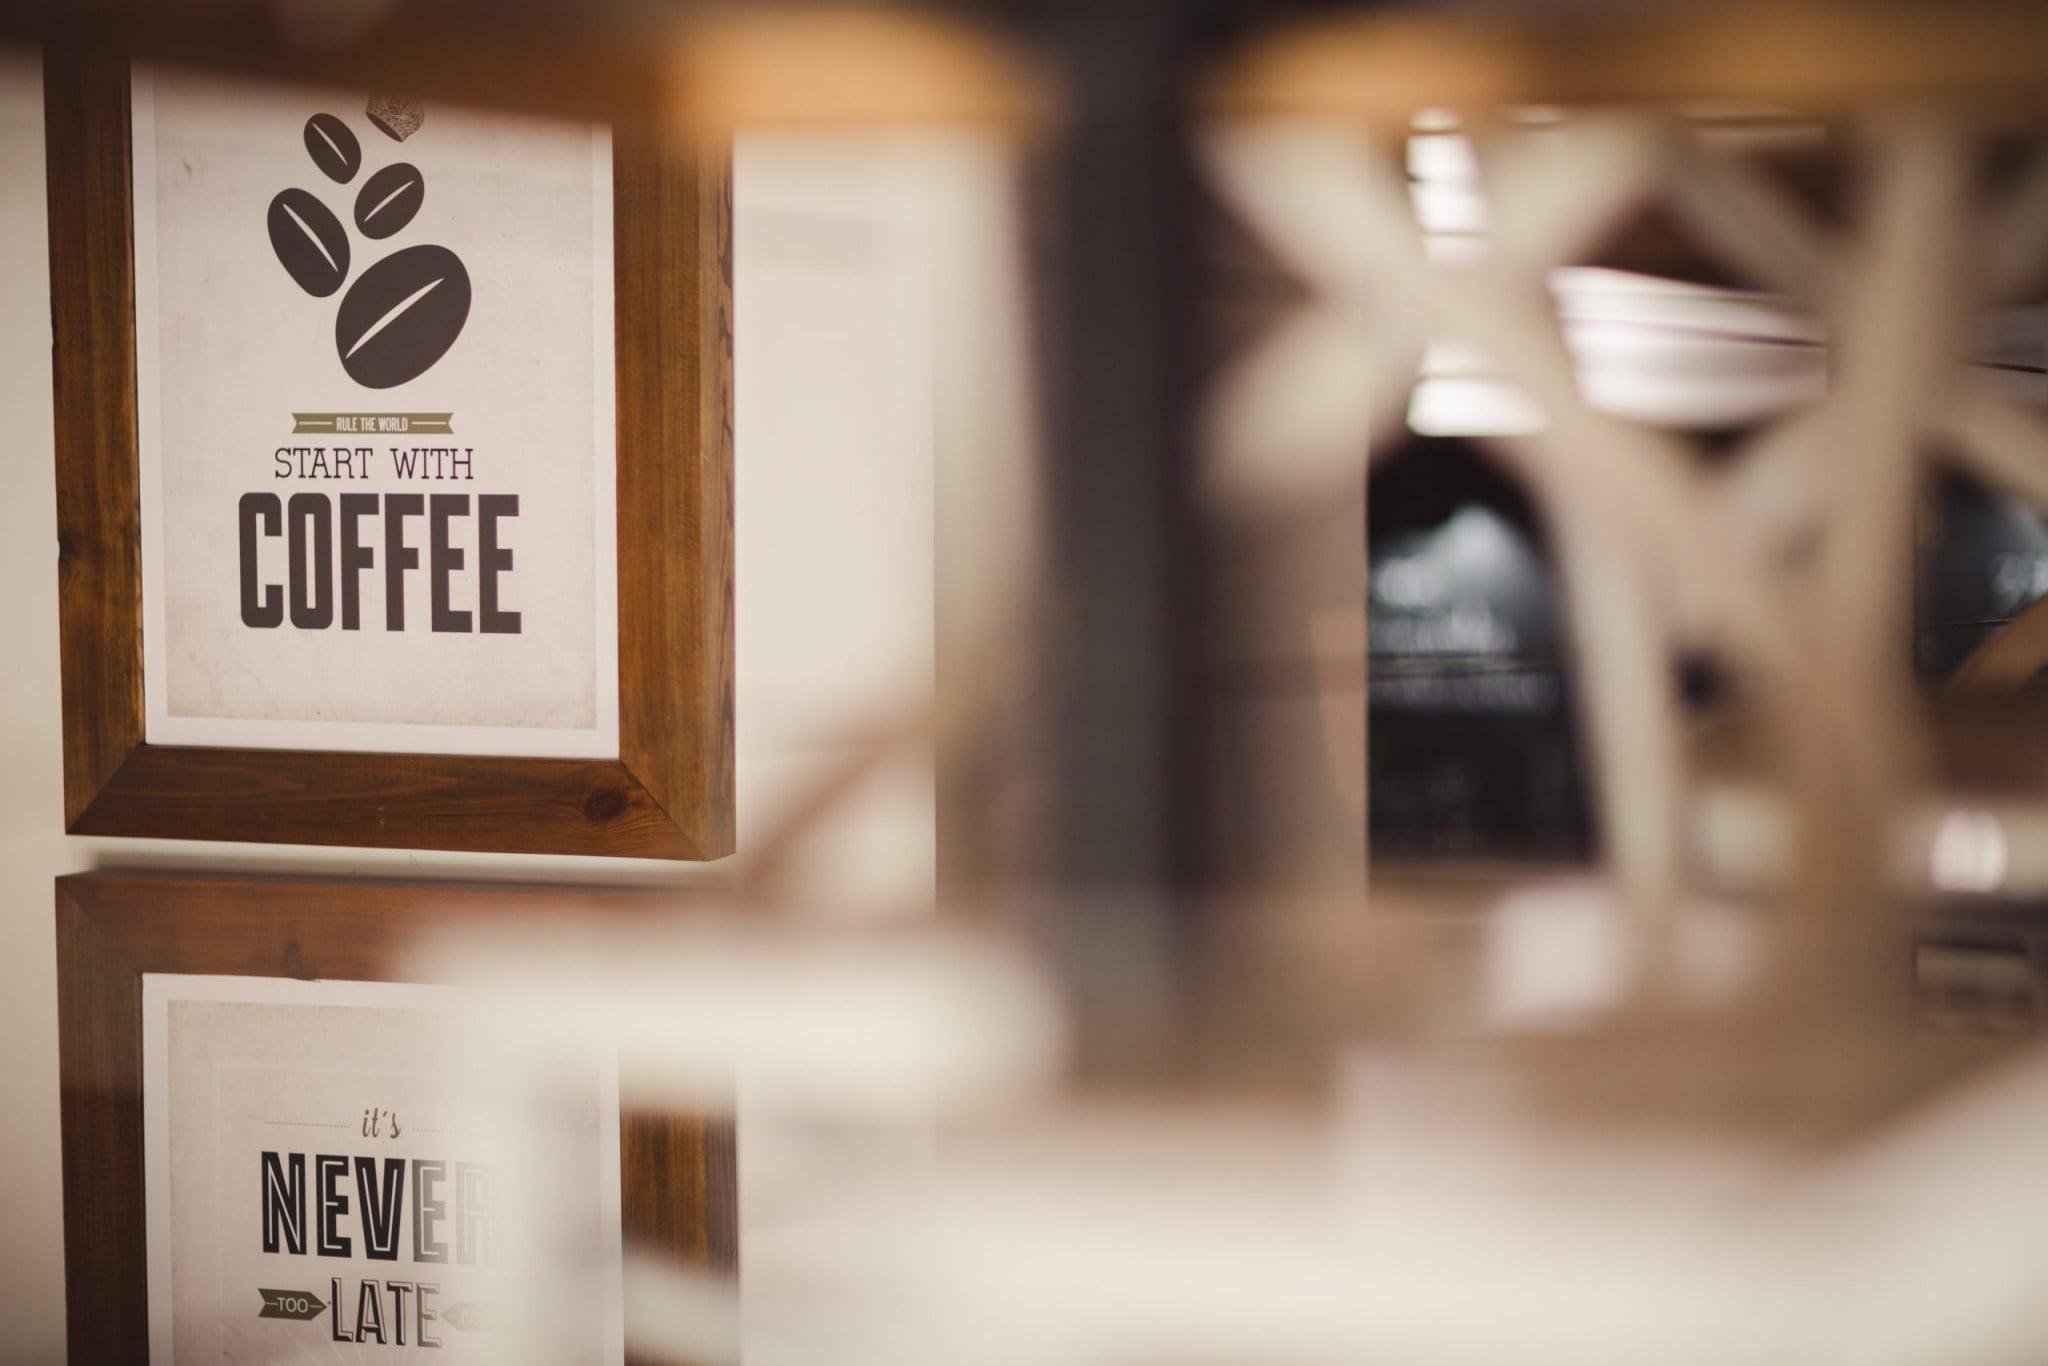 káva nico caffe